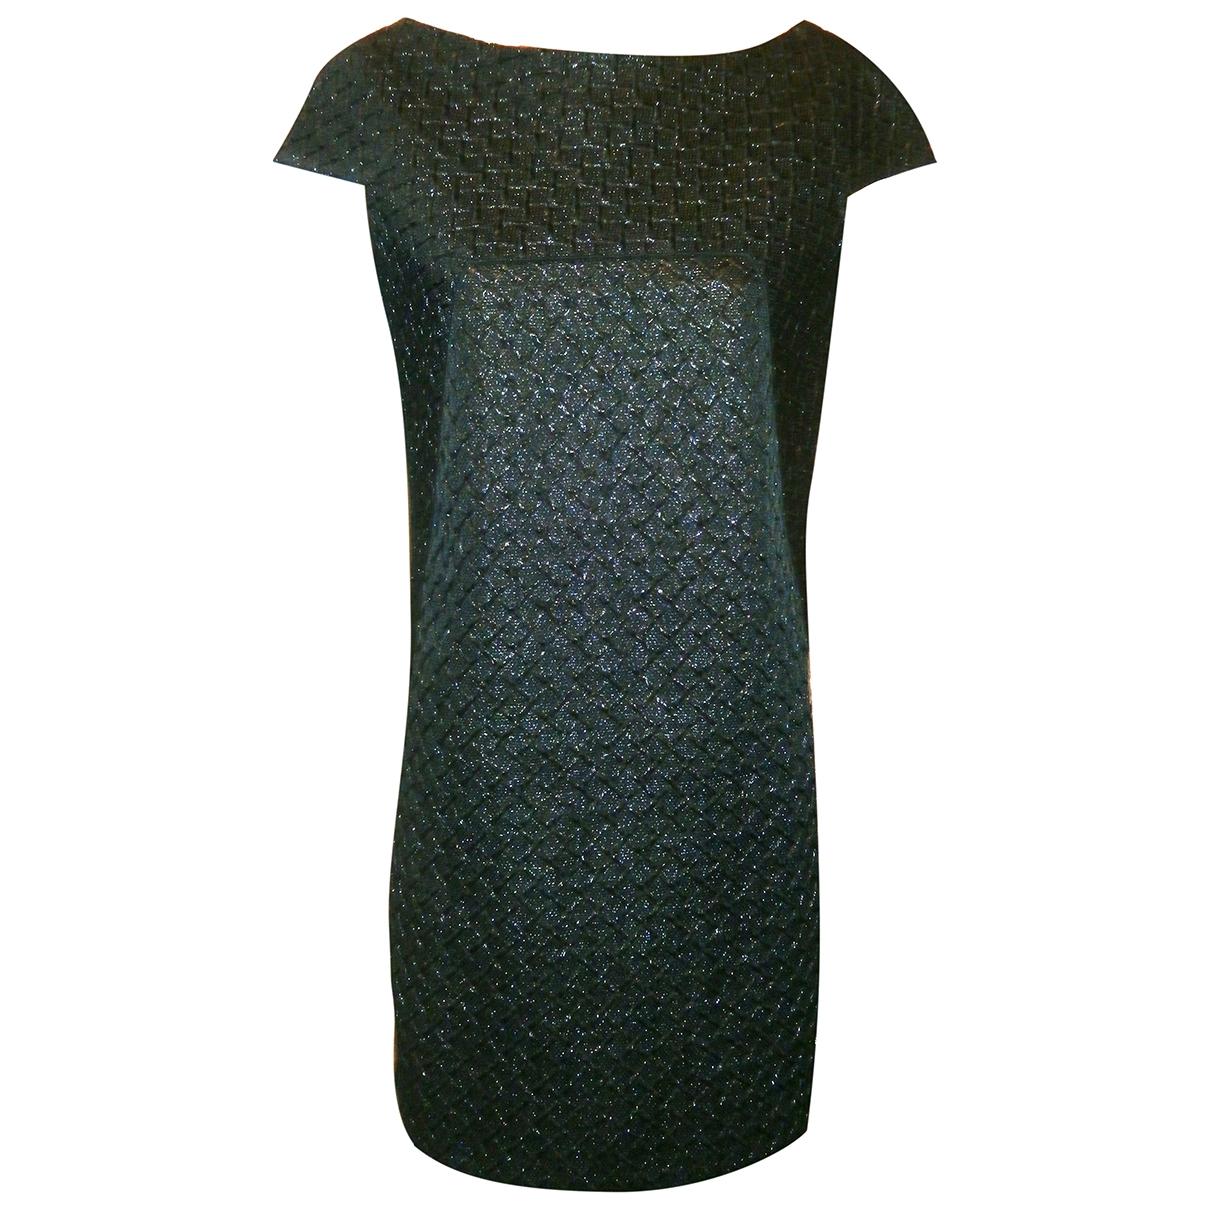 Dolce & Gabbana \N Black dress for Women M International